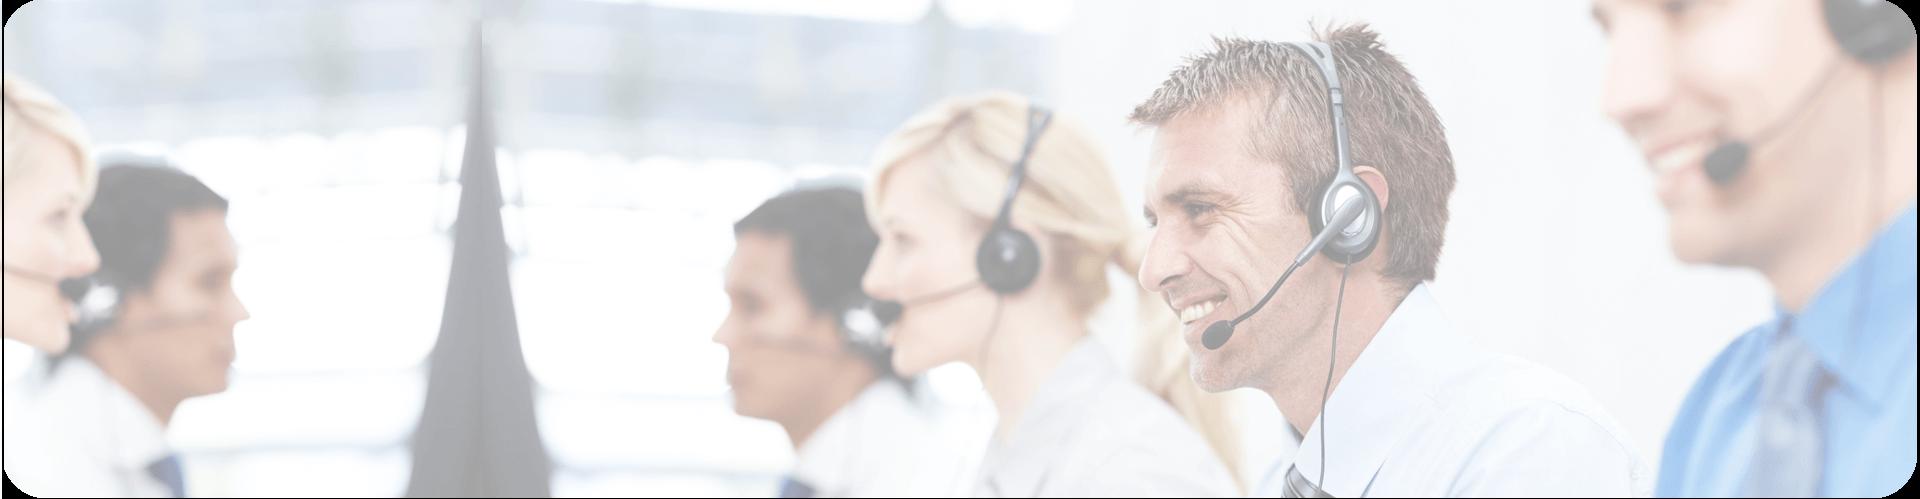 helpdesk operators wearing headsets